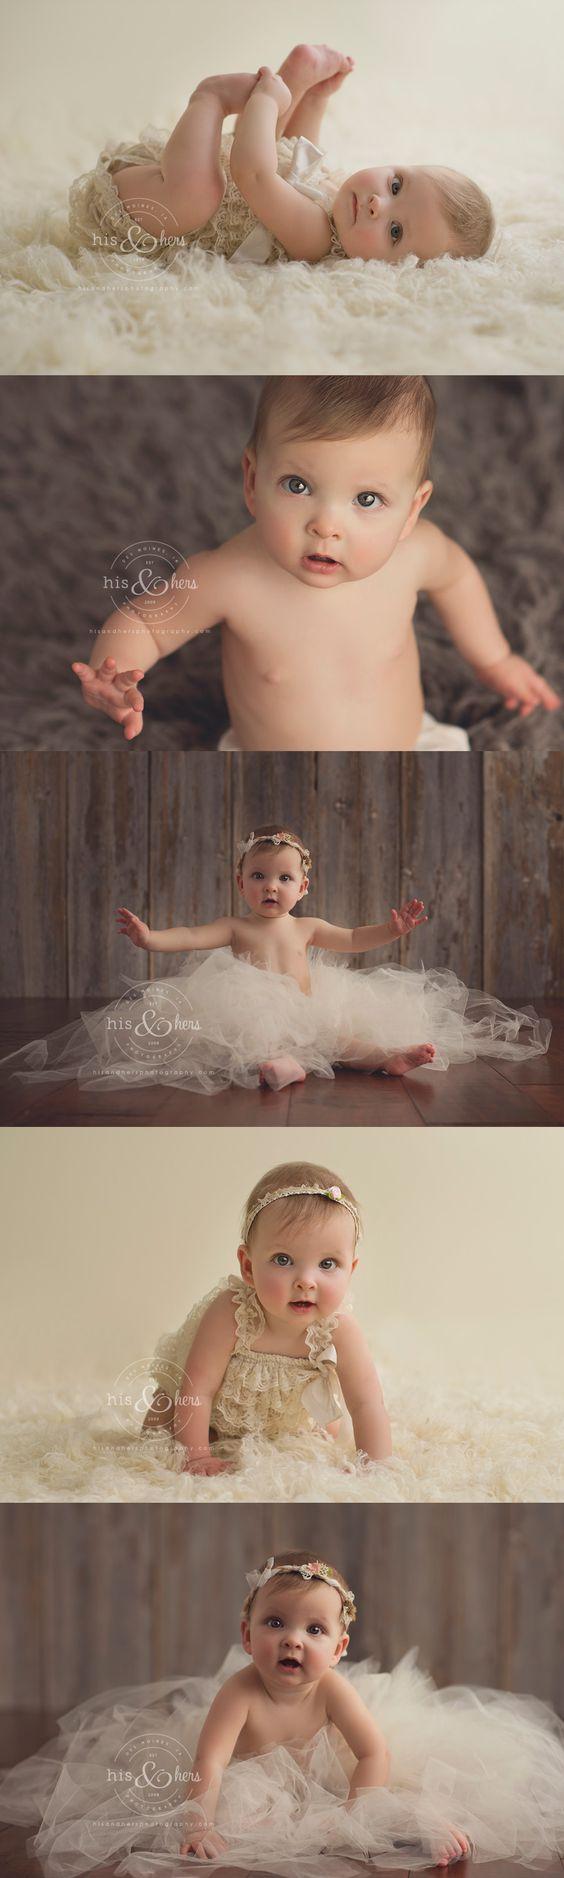 #iowa Child photographer, Darcy Milder   His & Hers Photography #DesMoinesIowa